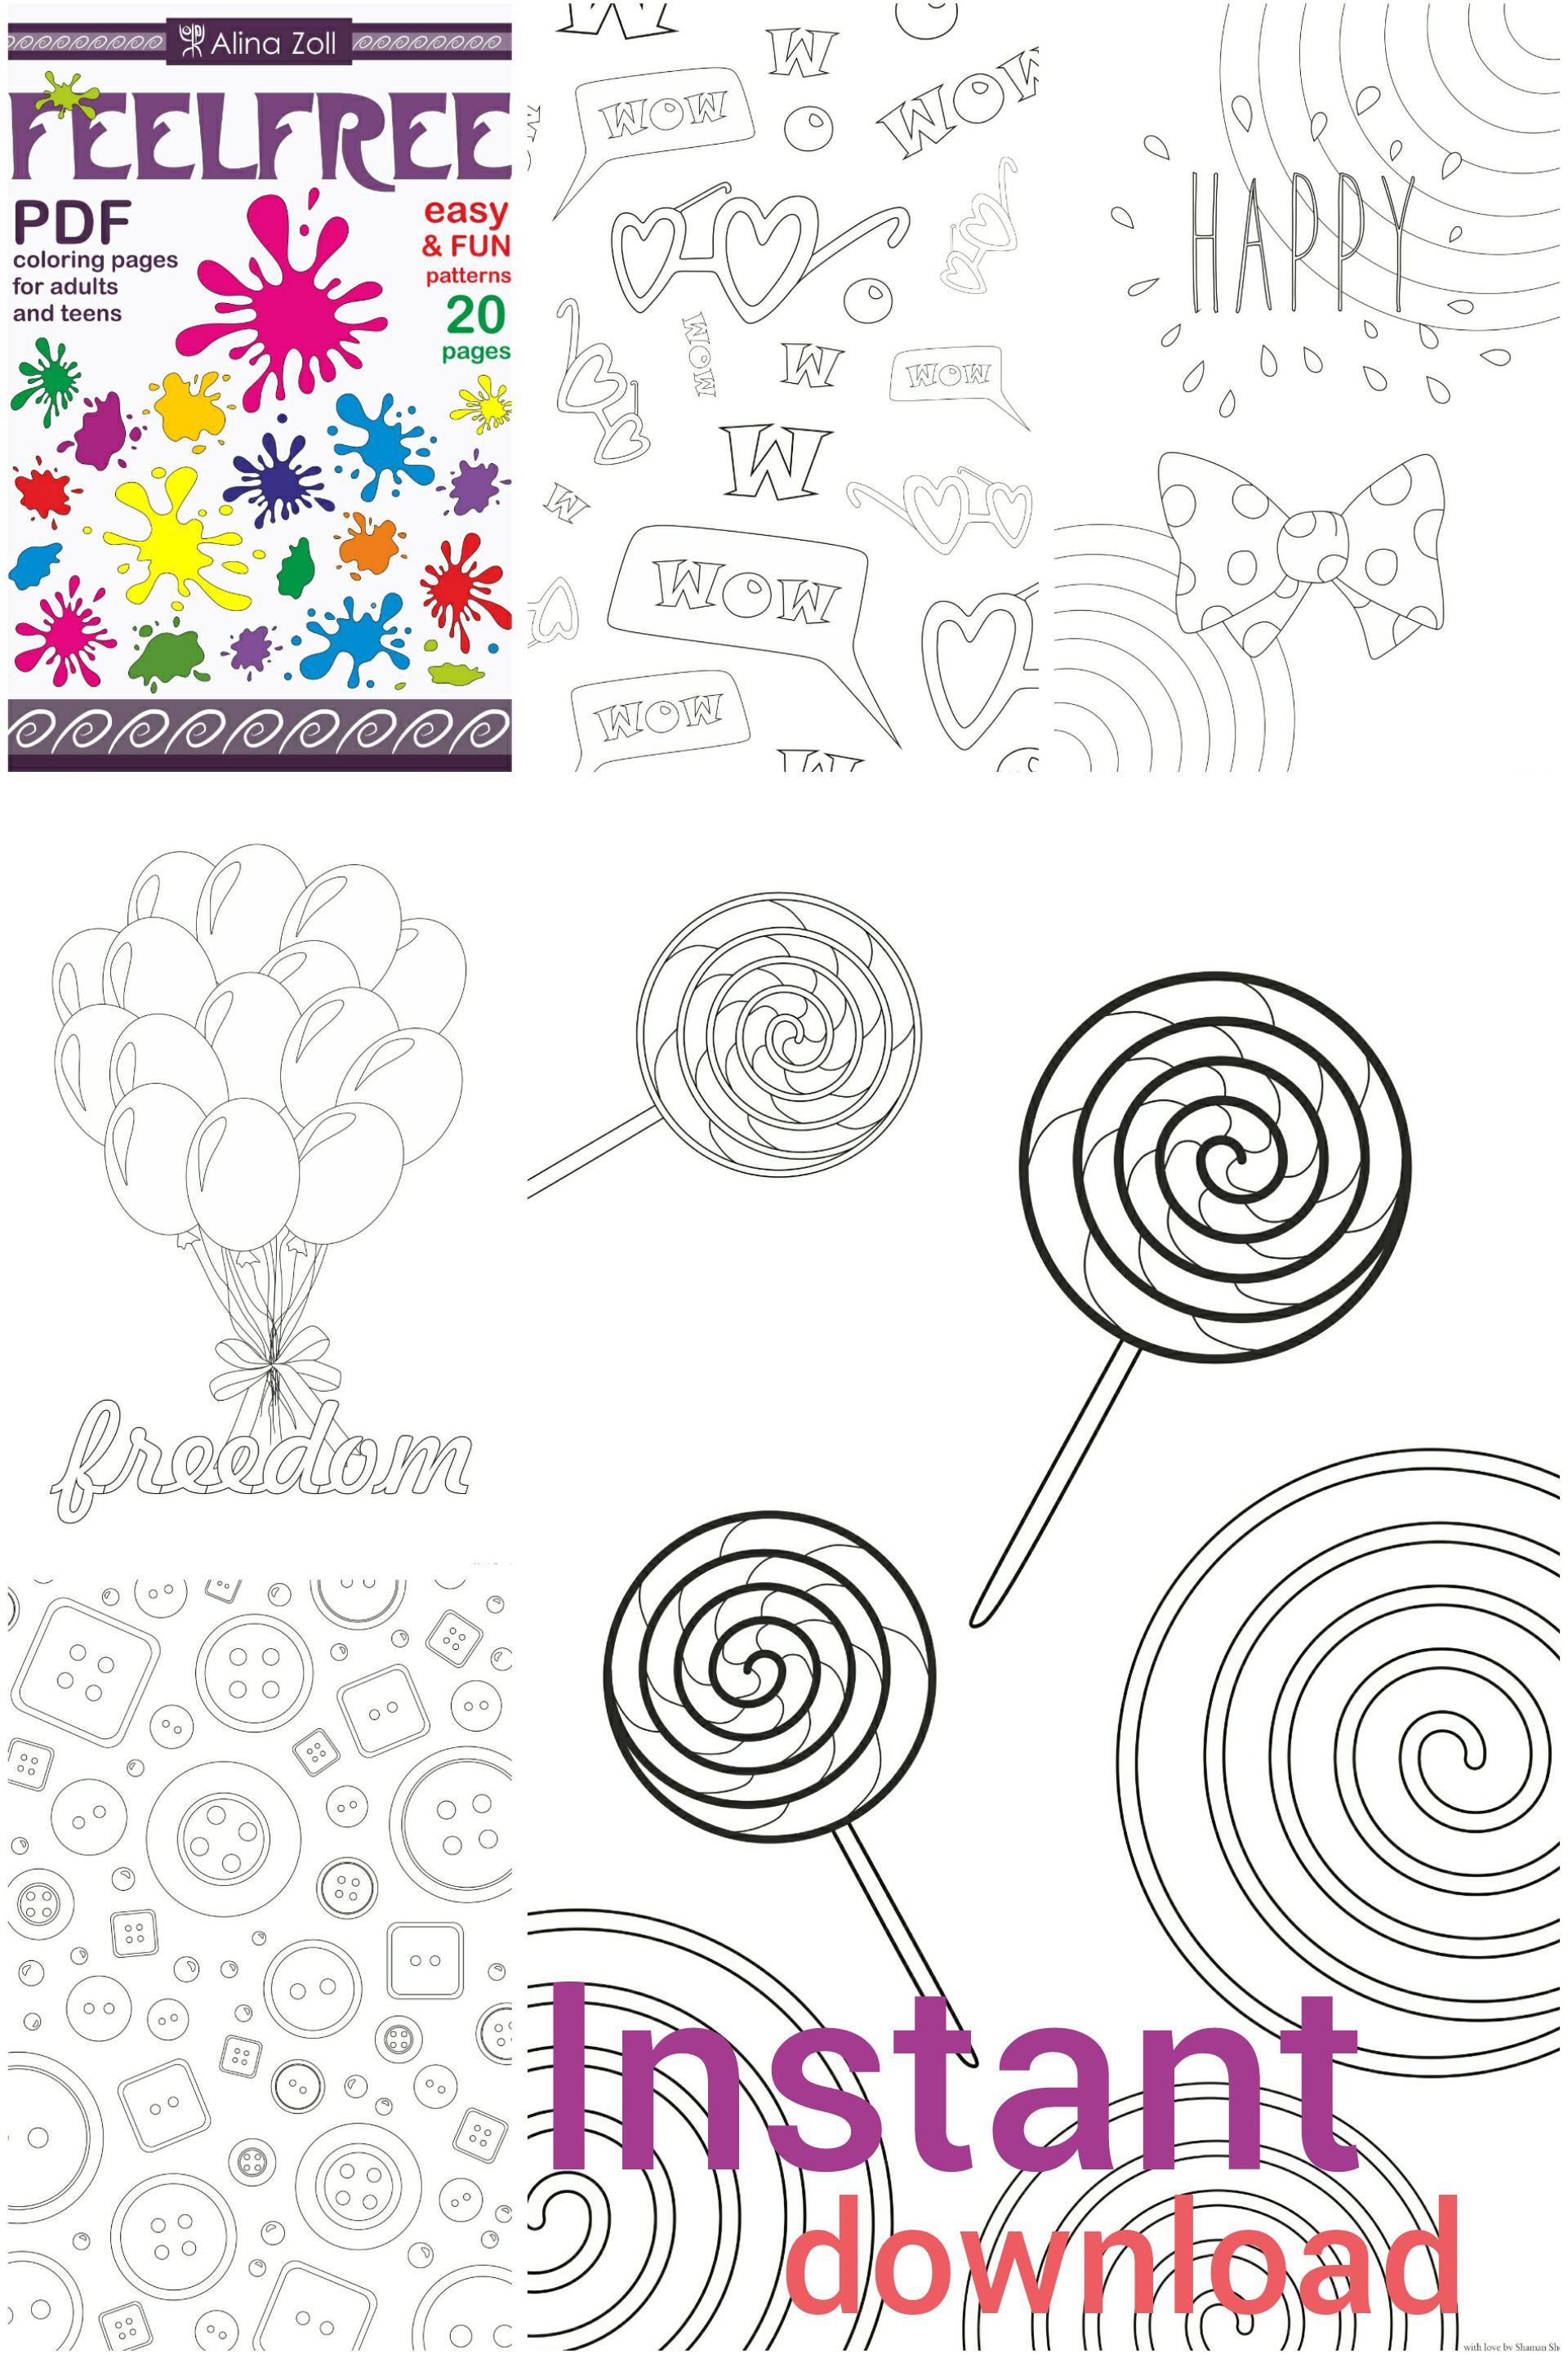 Digital Coloring Book Pdf Printable Coloring Pages Download Etsy Coloring Books Coloring Pages Cool Coloring Pages